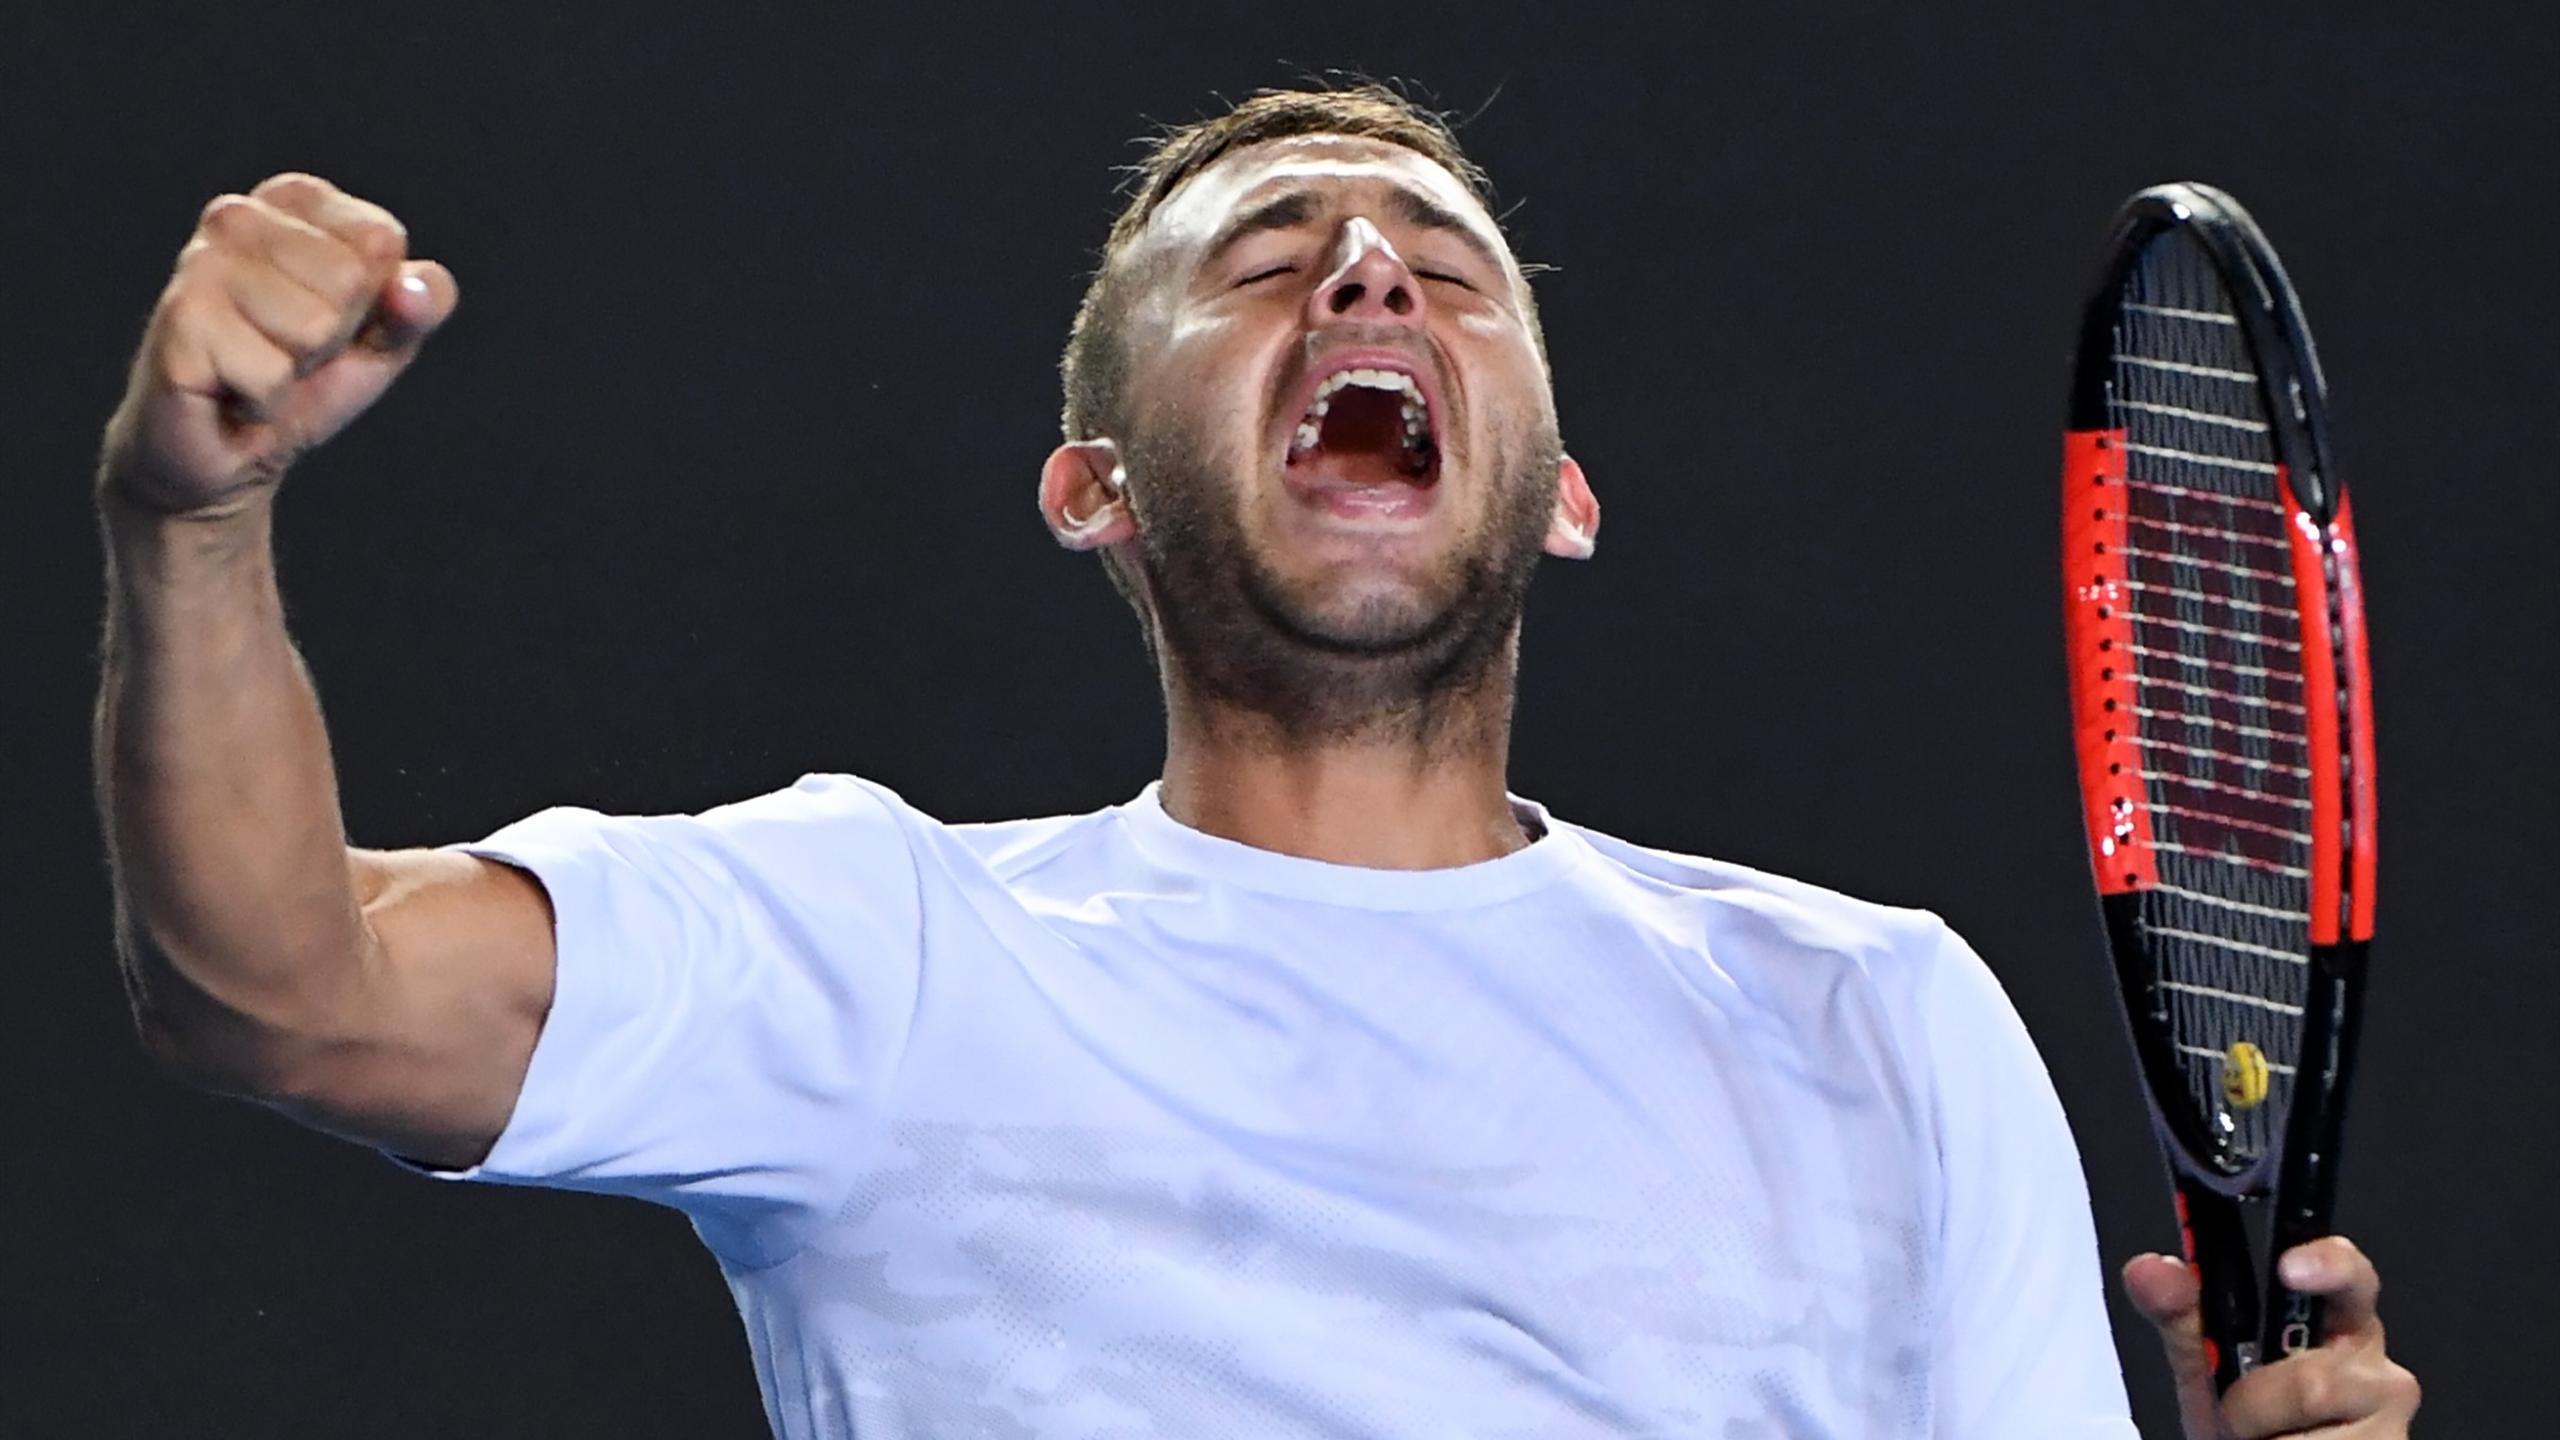 Britain's Daniel Evans celebrates his victory against Croatia's Marin Cilic